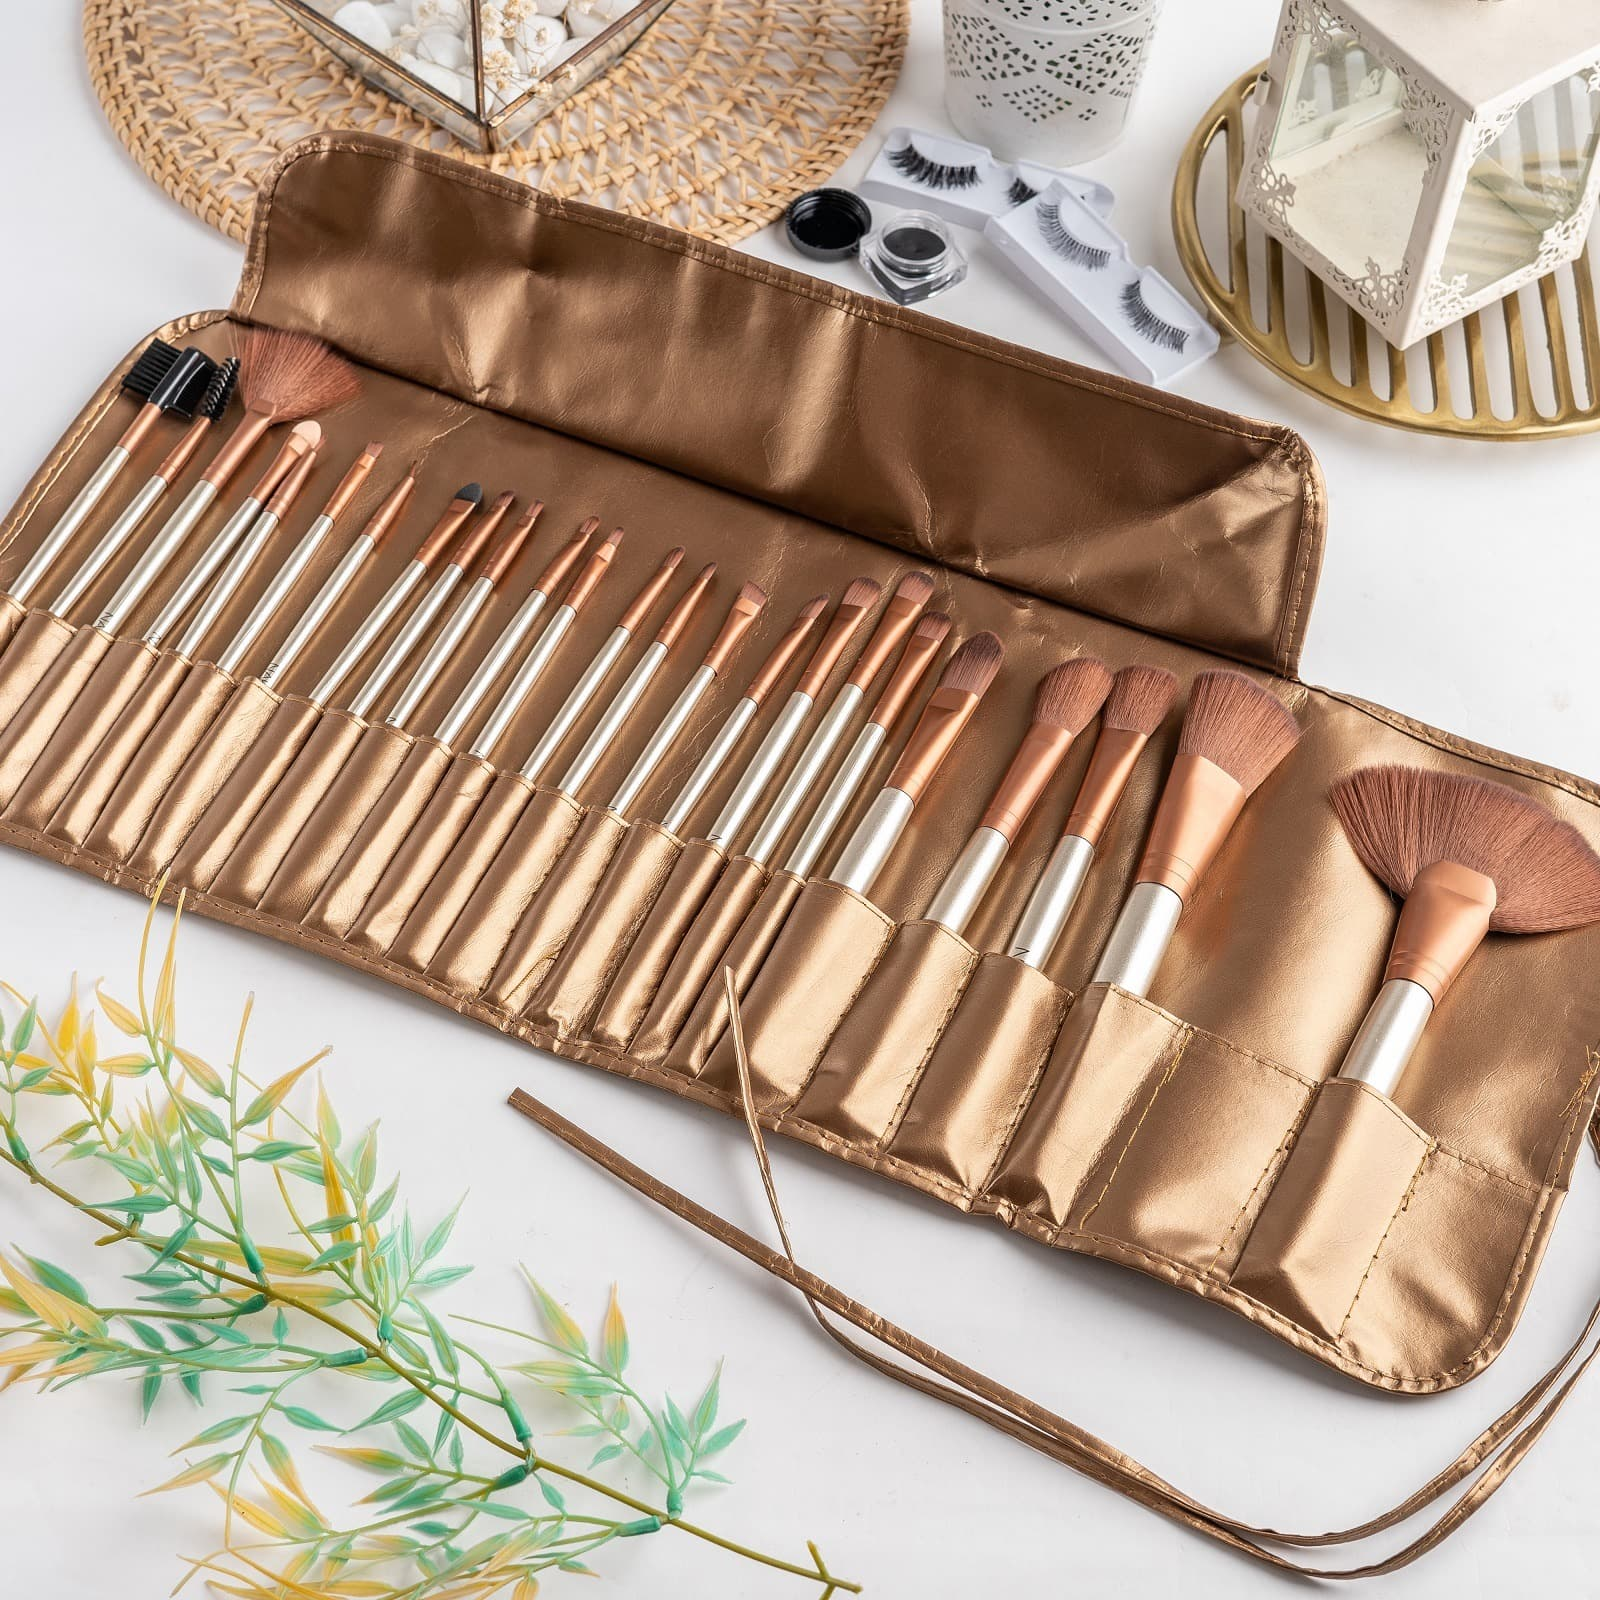 ARAMI Golden Korean Makeup Brush w Pouch Set Dompet Kuas Wajah 24 s thumbnail